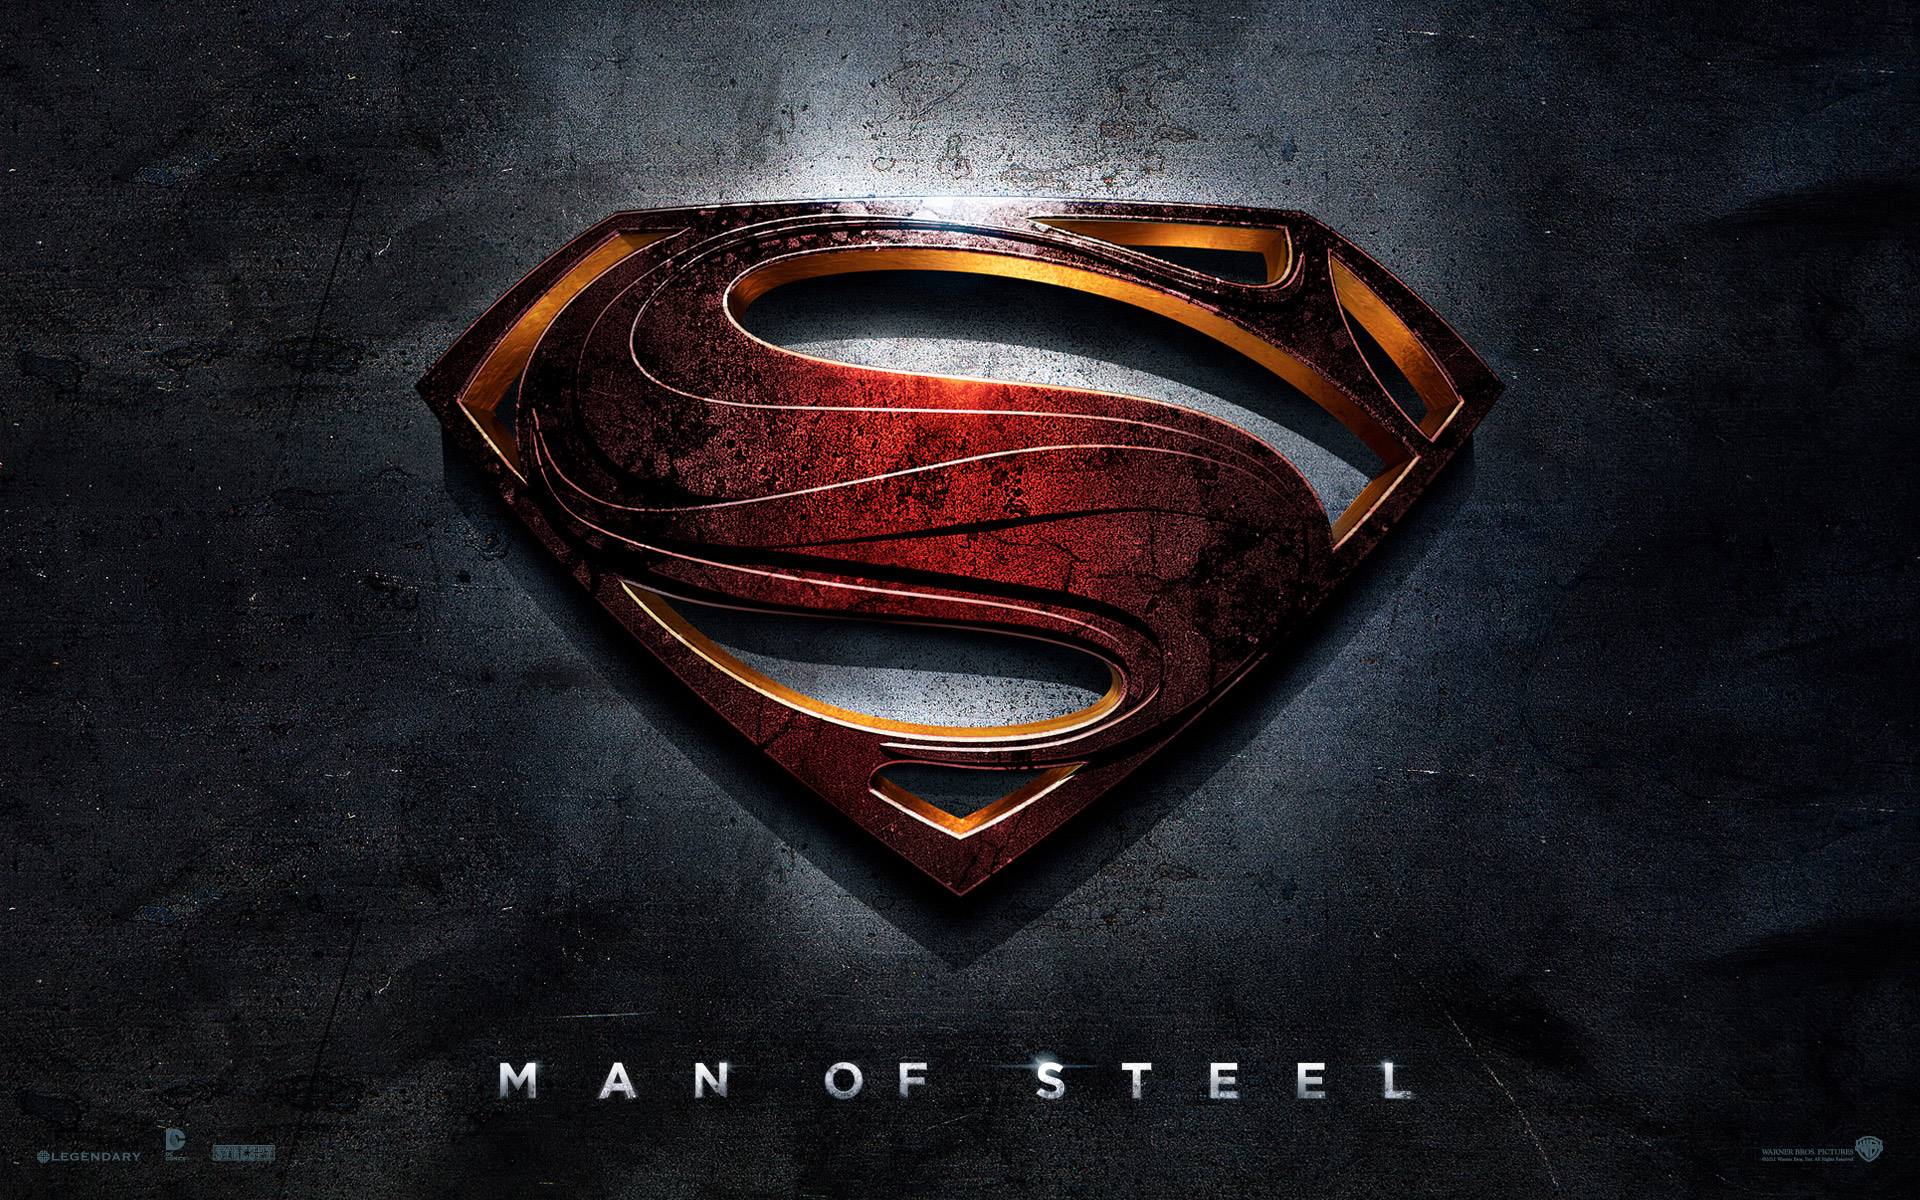 the man of steel movie hd wallpapers man of steel logo wallpaper 1920x1200